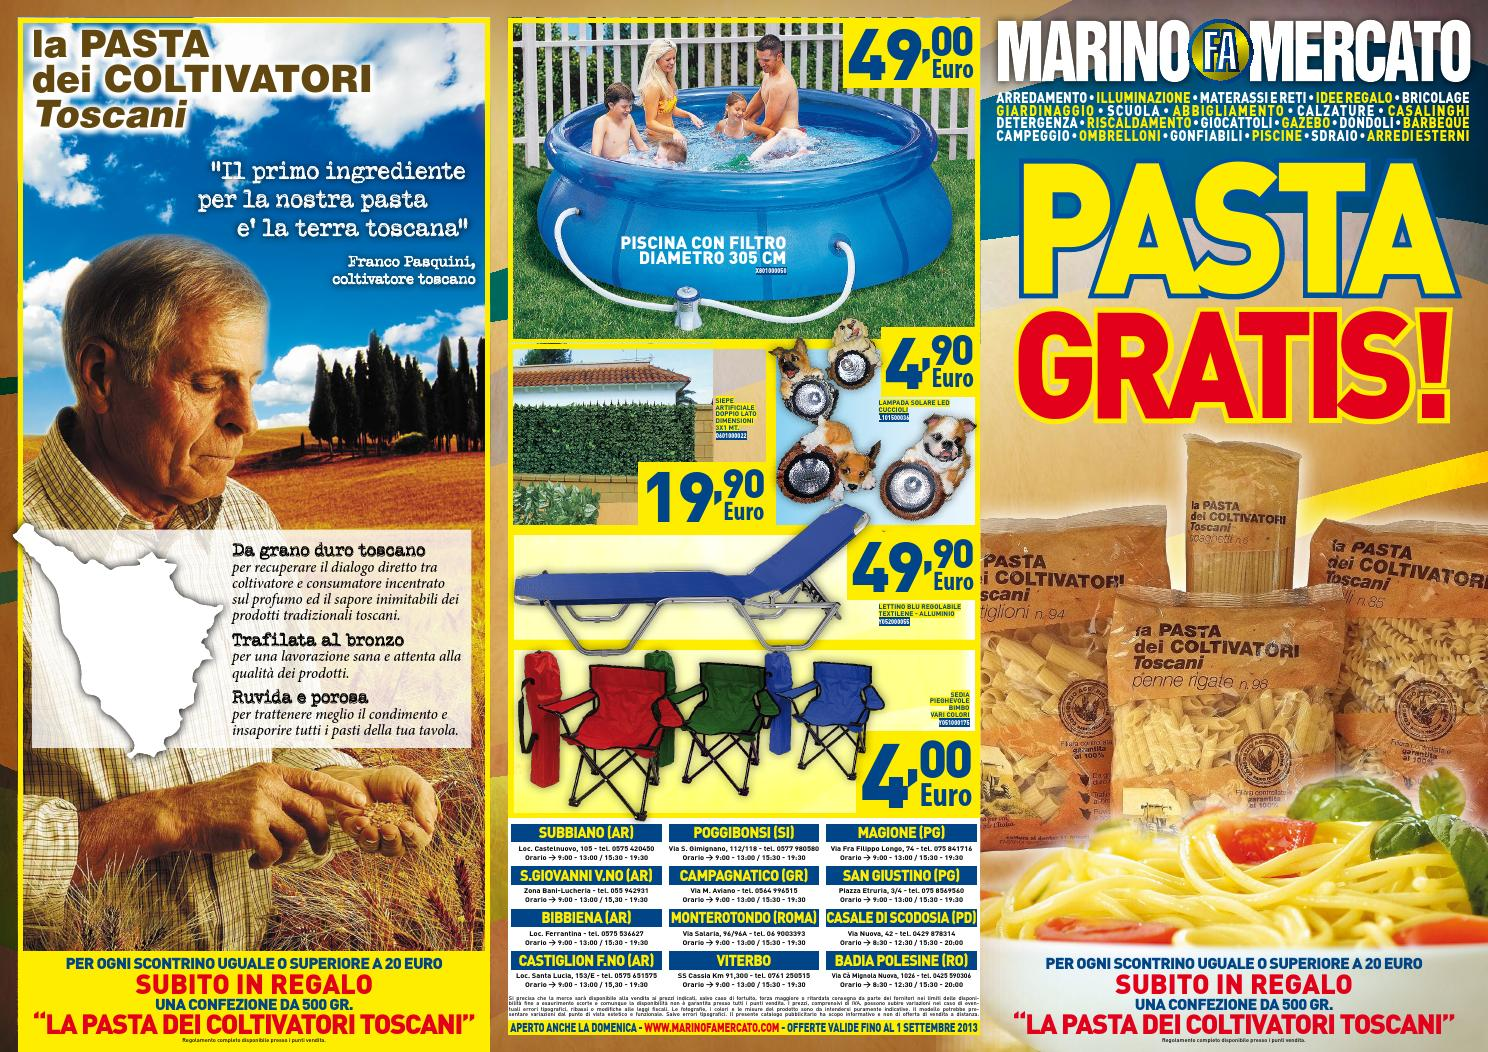 Marino fa mercato pasta gratis by marino fa mercato spa for Marino fa mercato letti